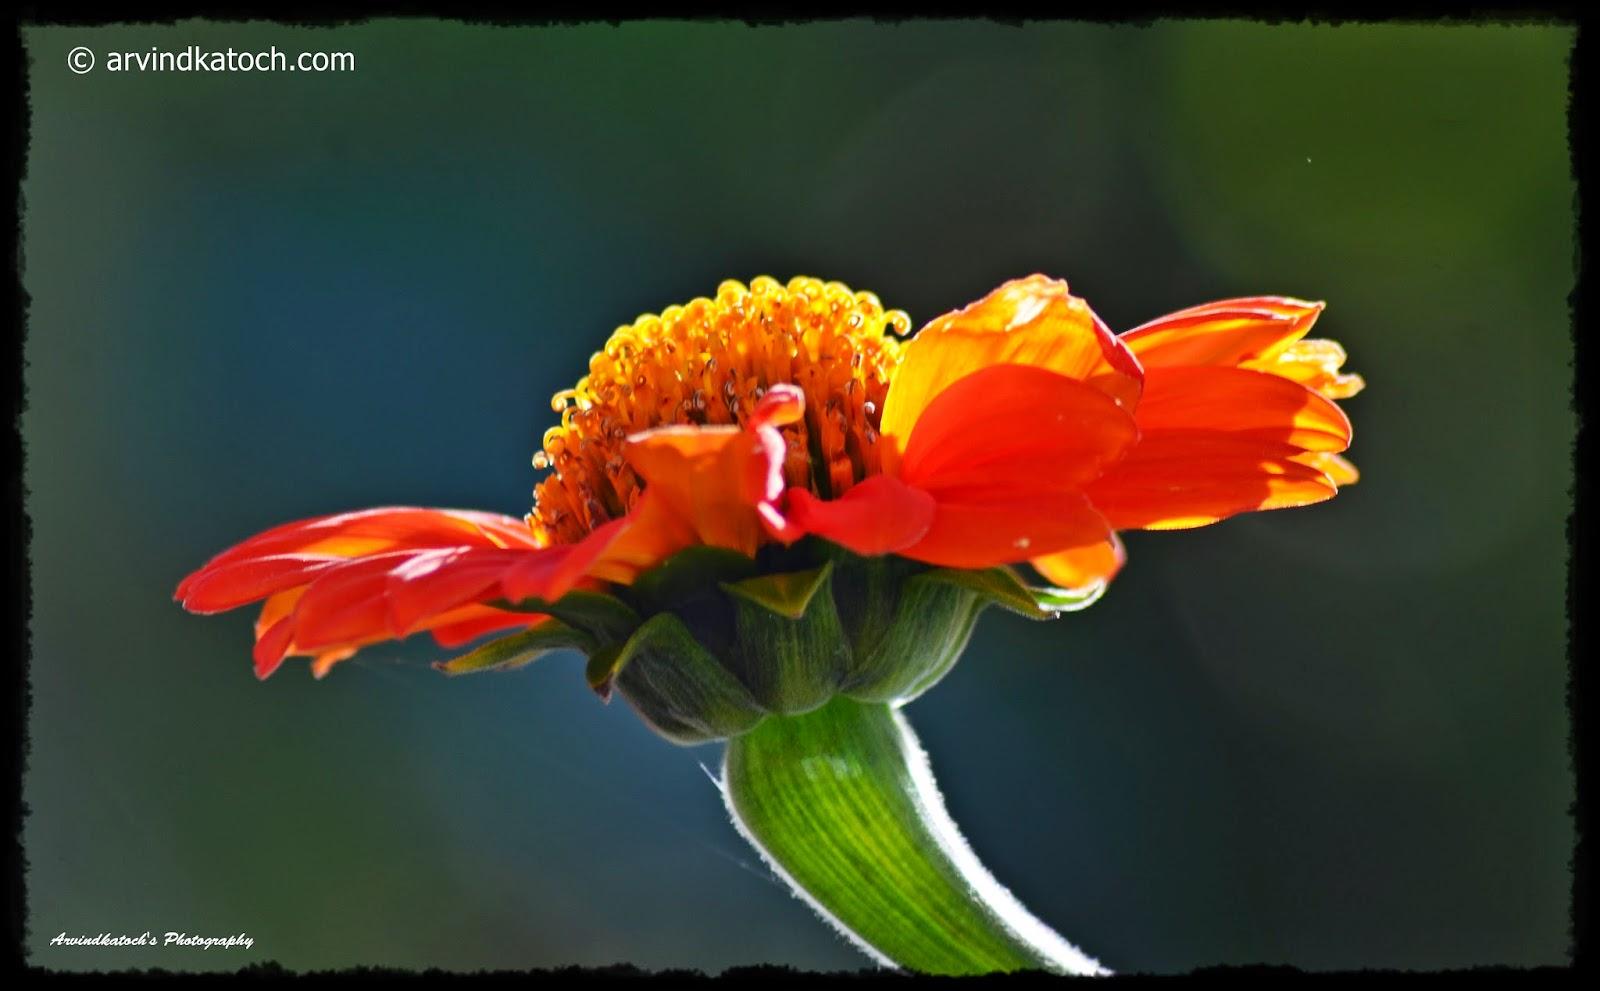 Sunlight, Flower, Morning, Beautiful